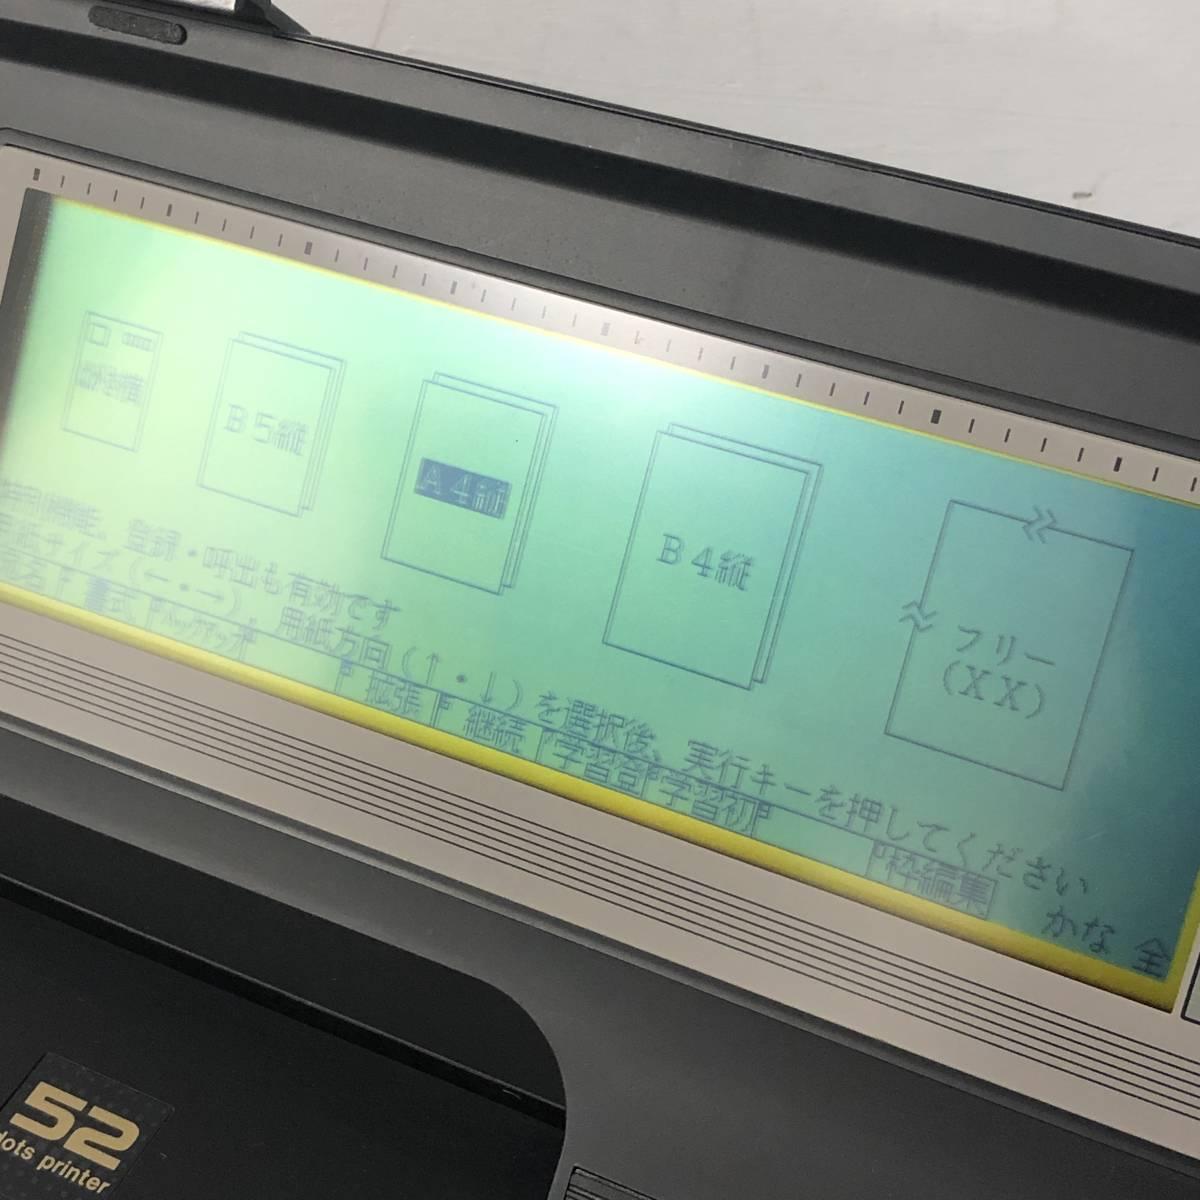 SHARP シャープ 日本語ワードプロセッサ 書院 WD-290W ワープロ 52ドットプリンター 取扱説明書 システムフロッピー 通電確認済 &_画像5